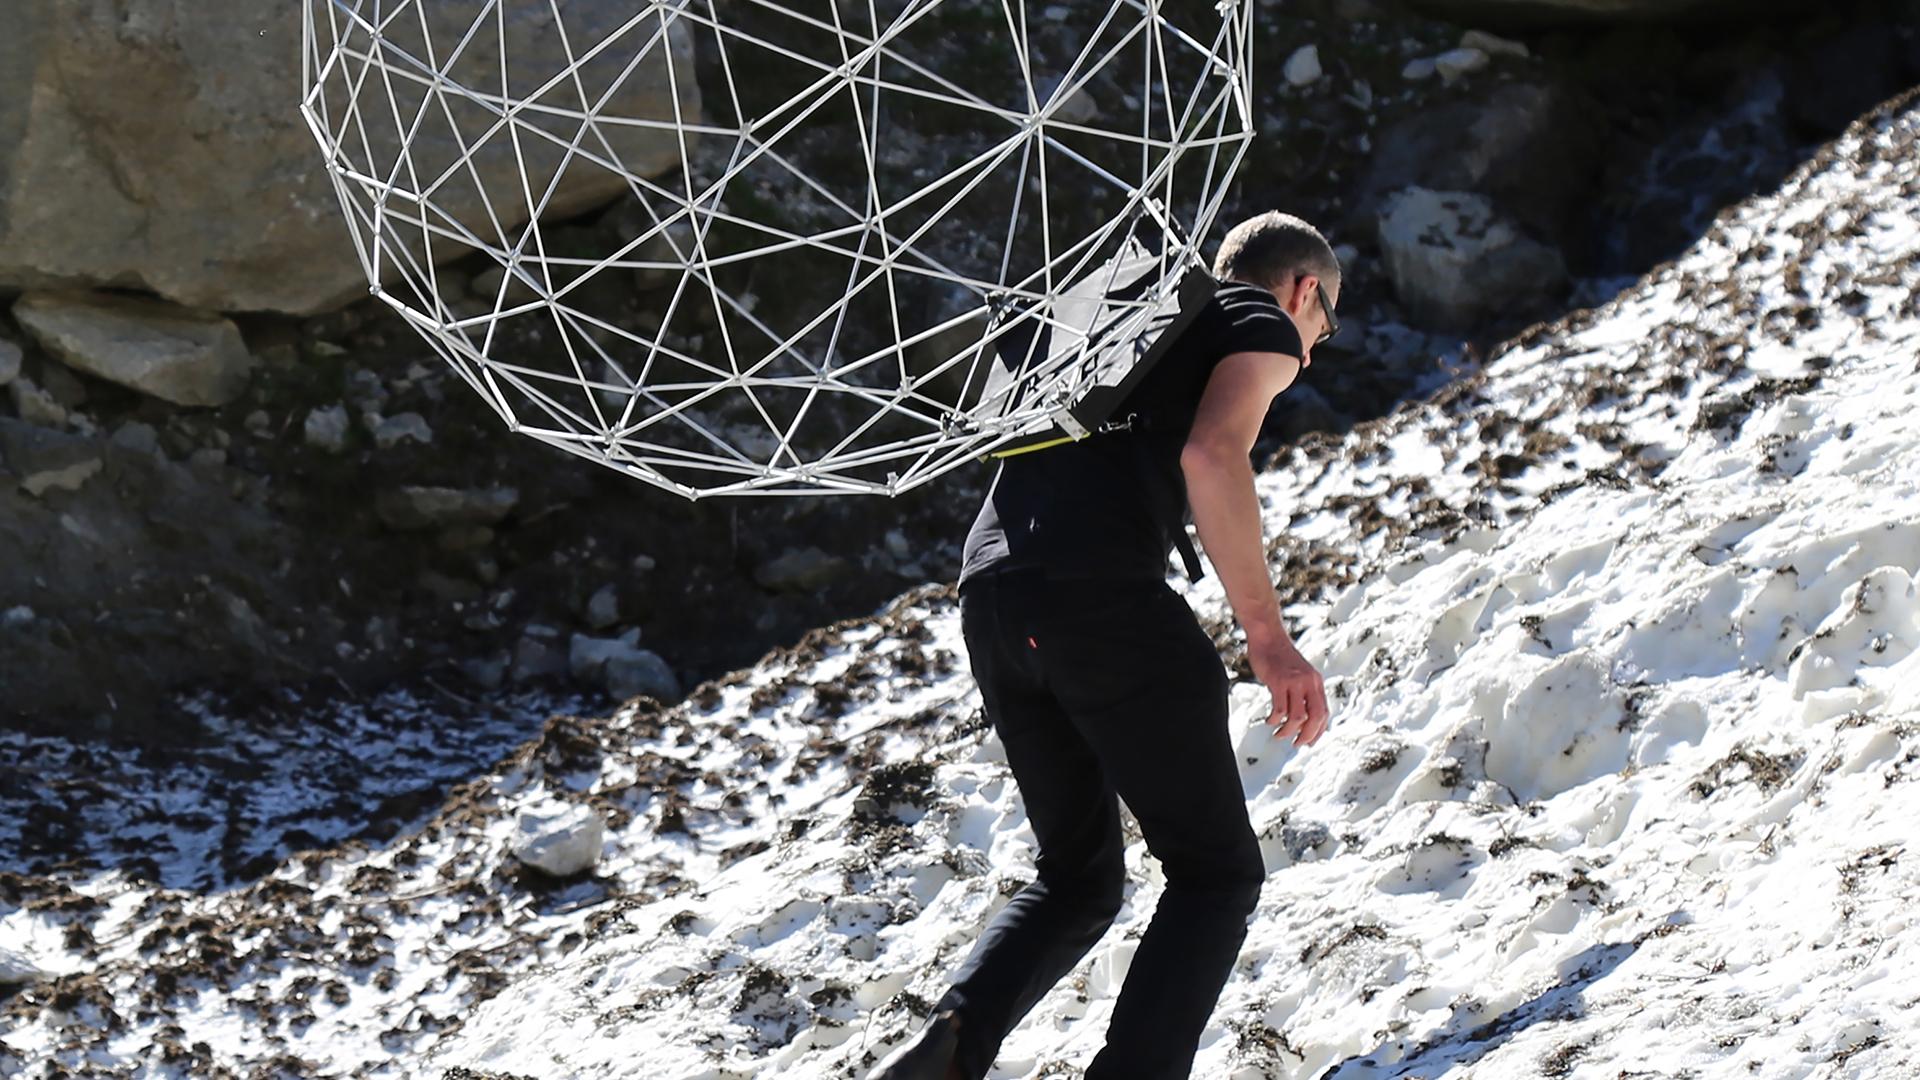 2019_A walk in the Alps (Axis Mundi) Main